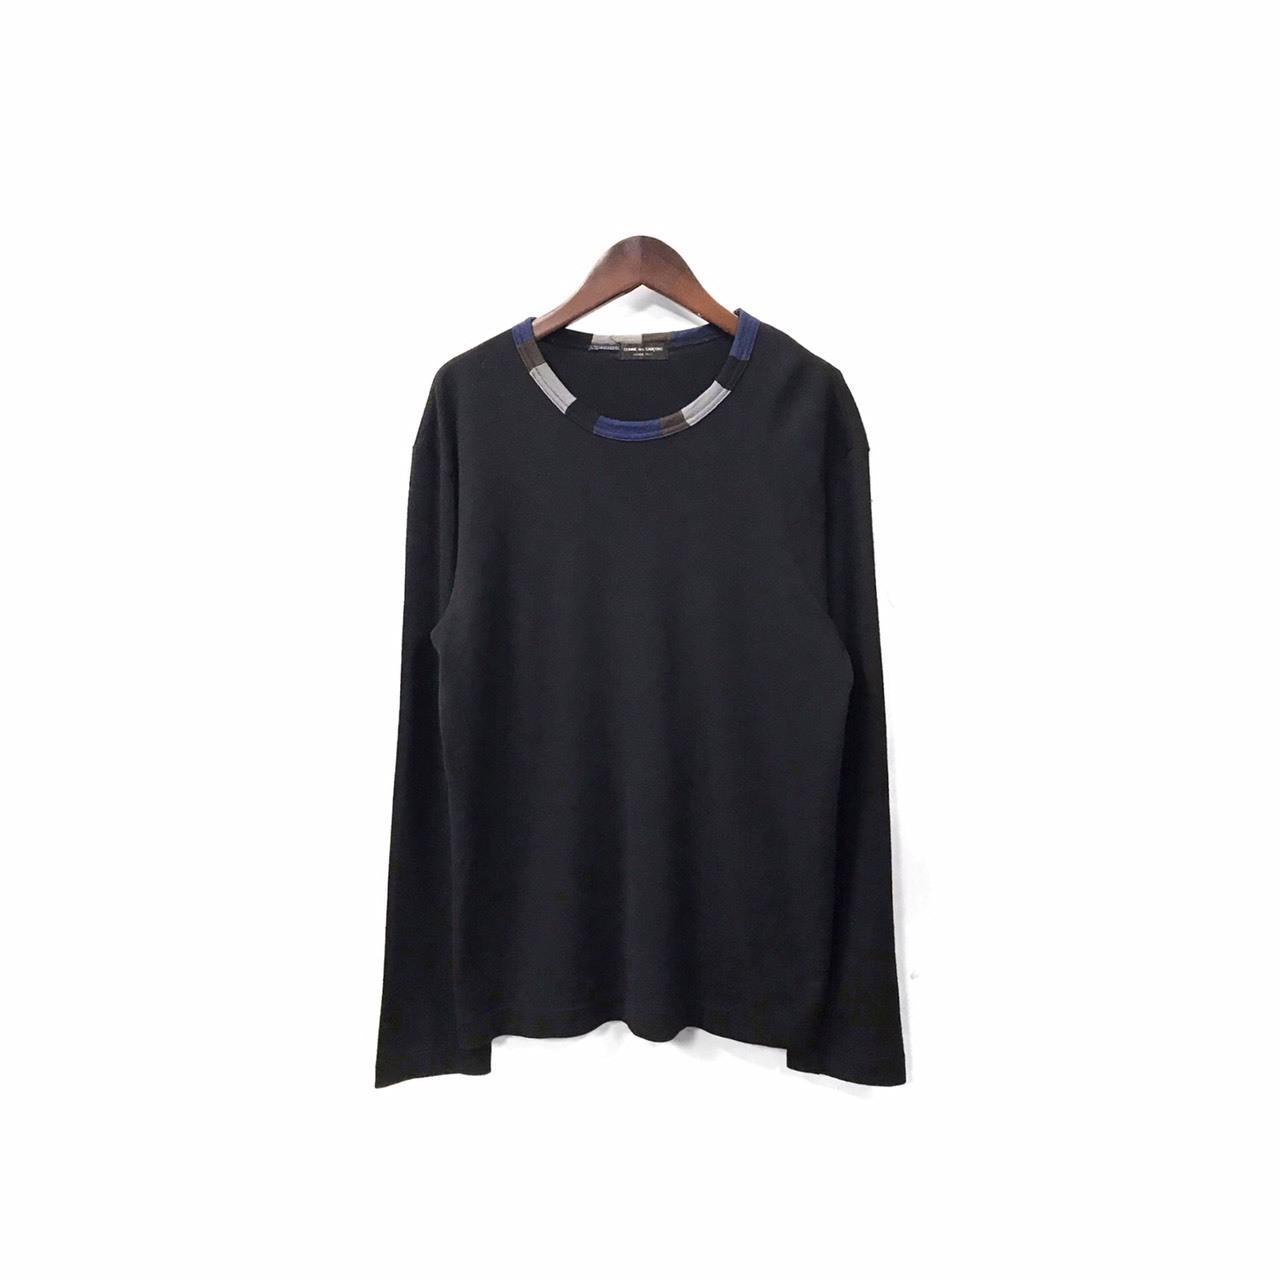 COMME des GARCONS HOMME PLUS - Wool Knit Tops ¥12000+tax